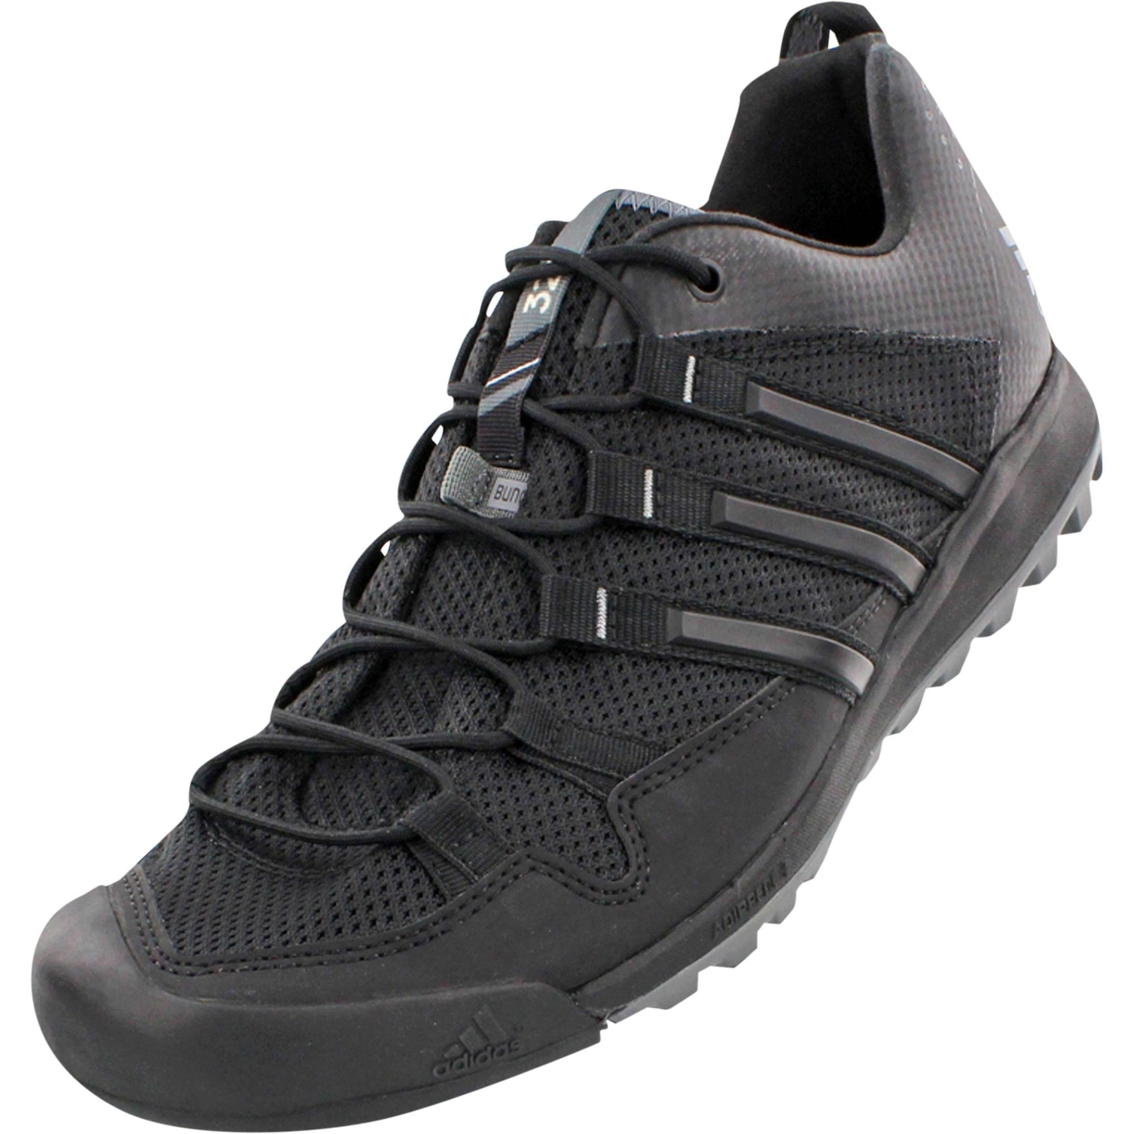 1f9c04c228 Adidas Outdoor Men s Terrex Solo Approach Shoes